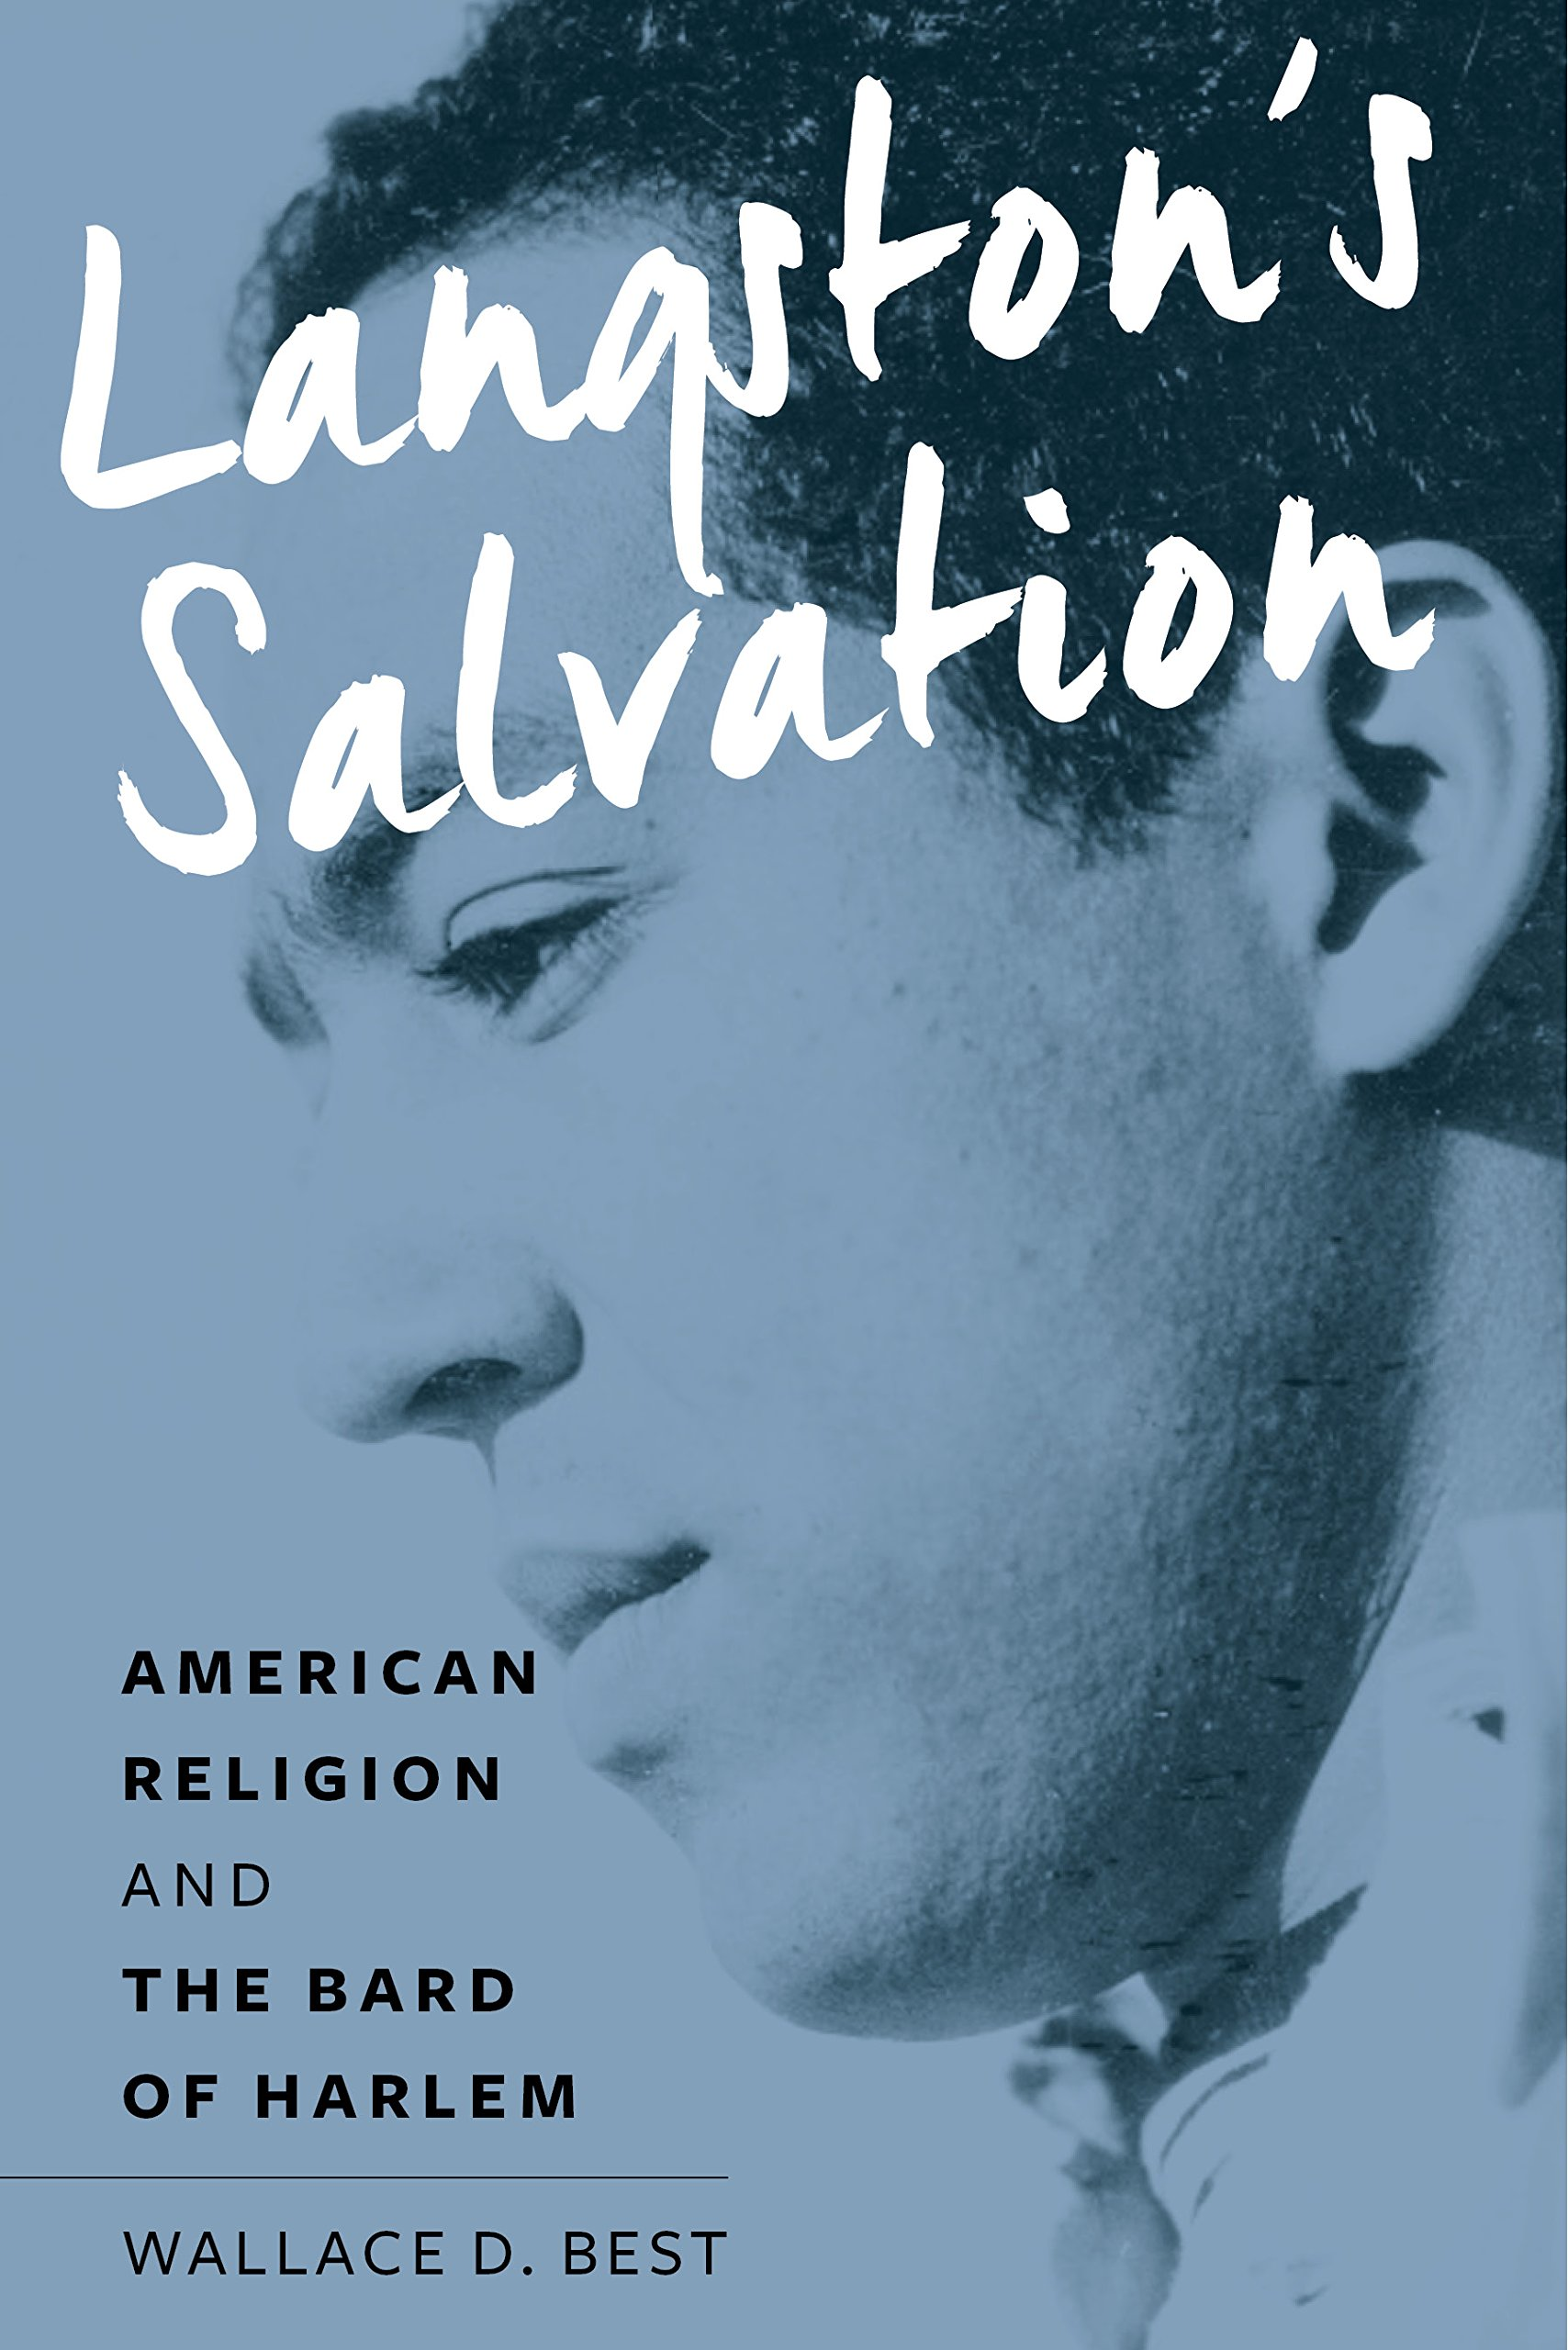 salvation by langston hughes audio